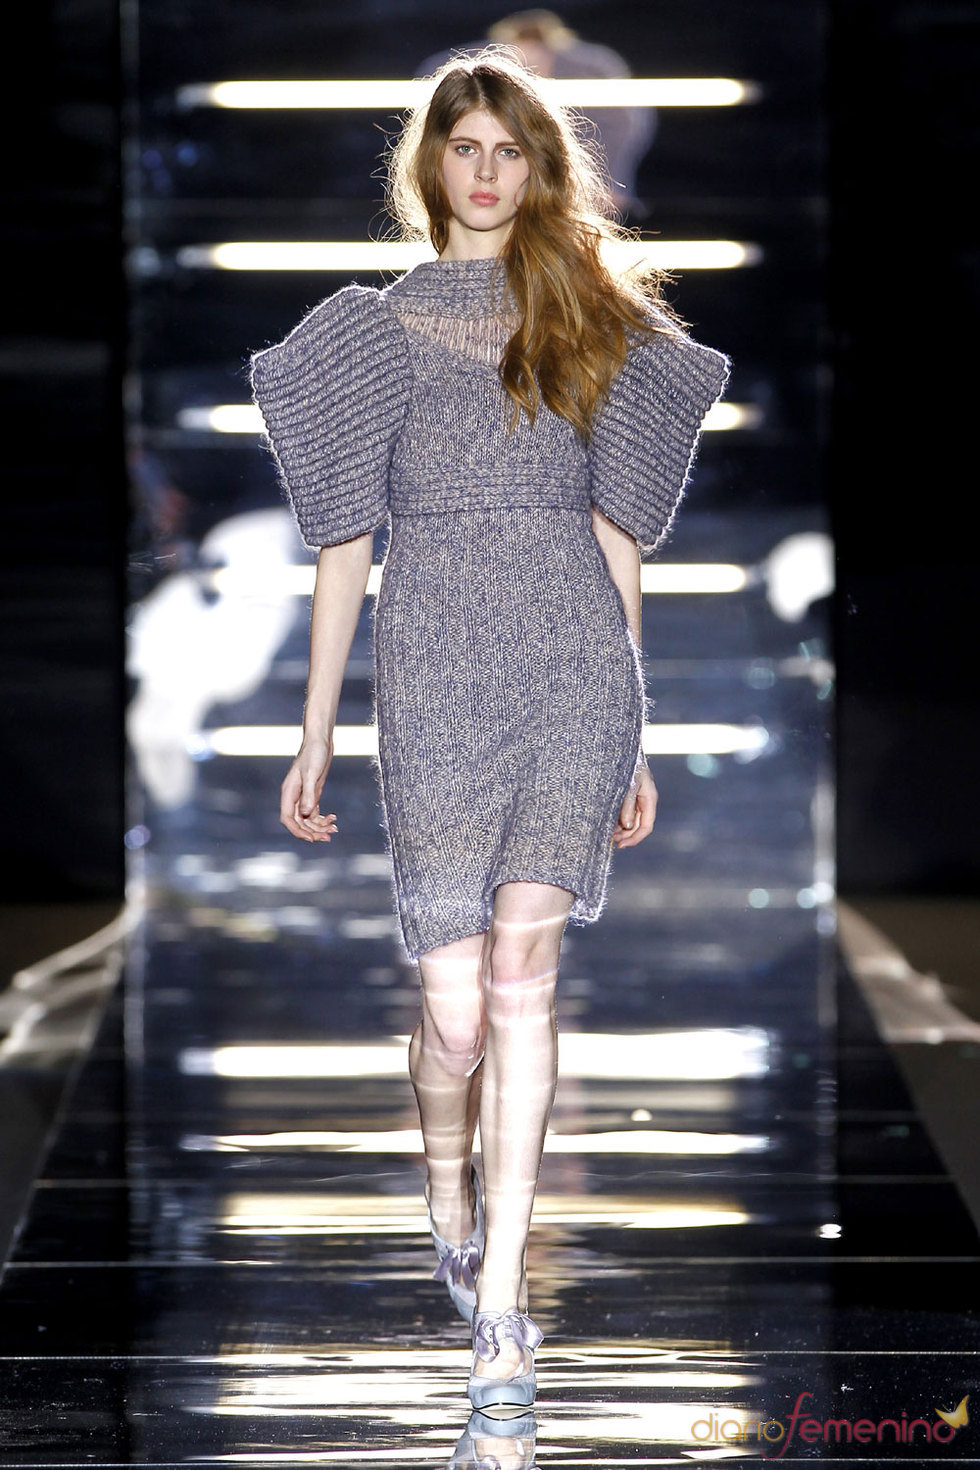 Conjunto de tricot de Sita Murt - Pasarela Cibeles 2010